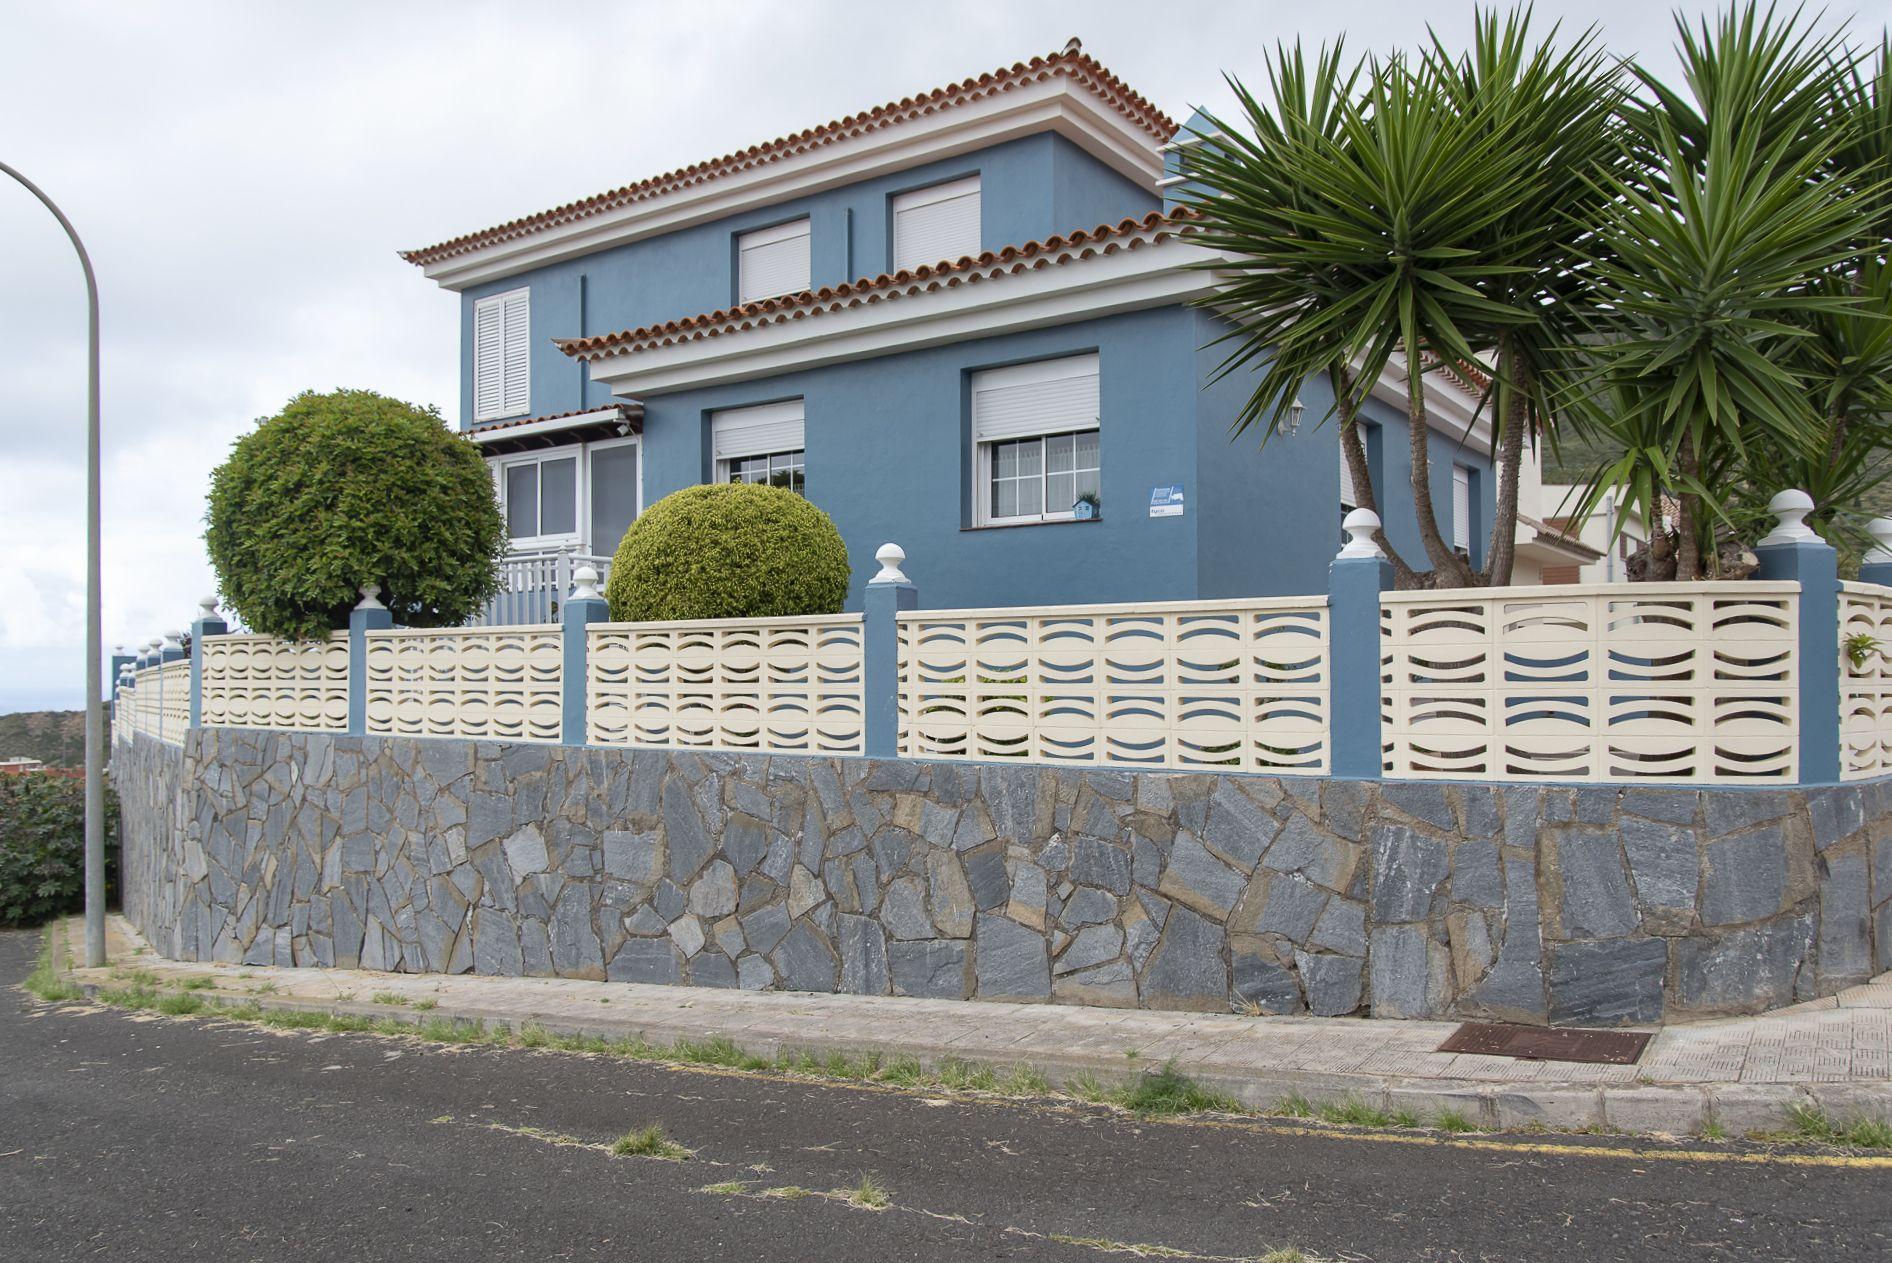 La Casa Azul - Tegueste. Fachada